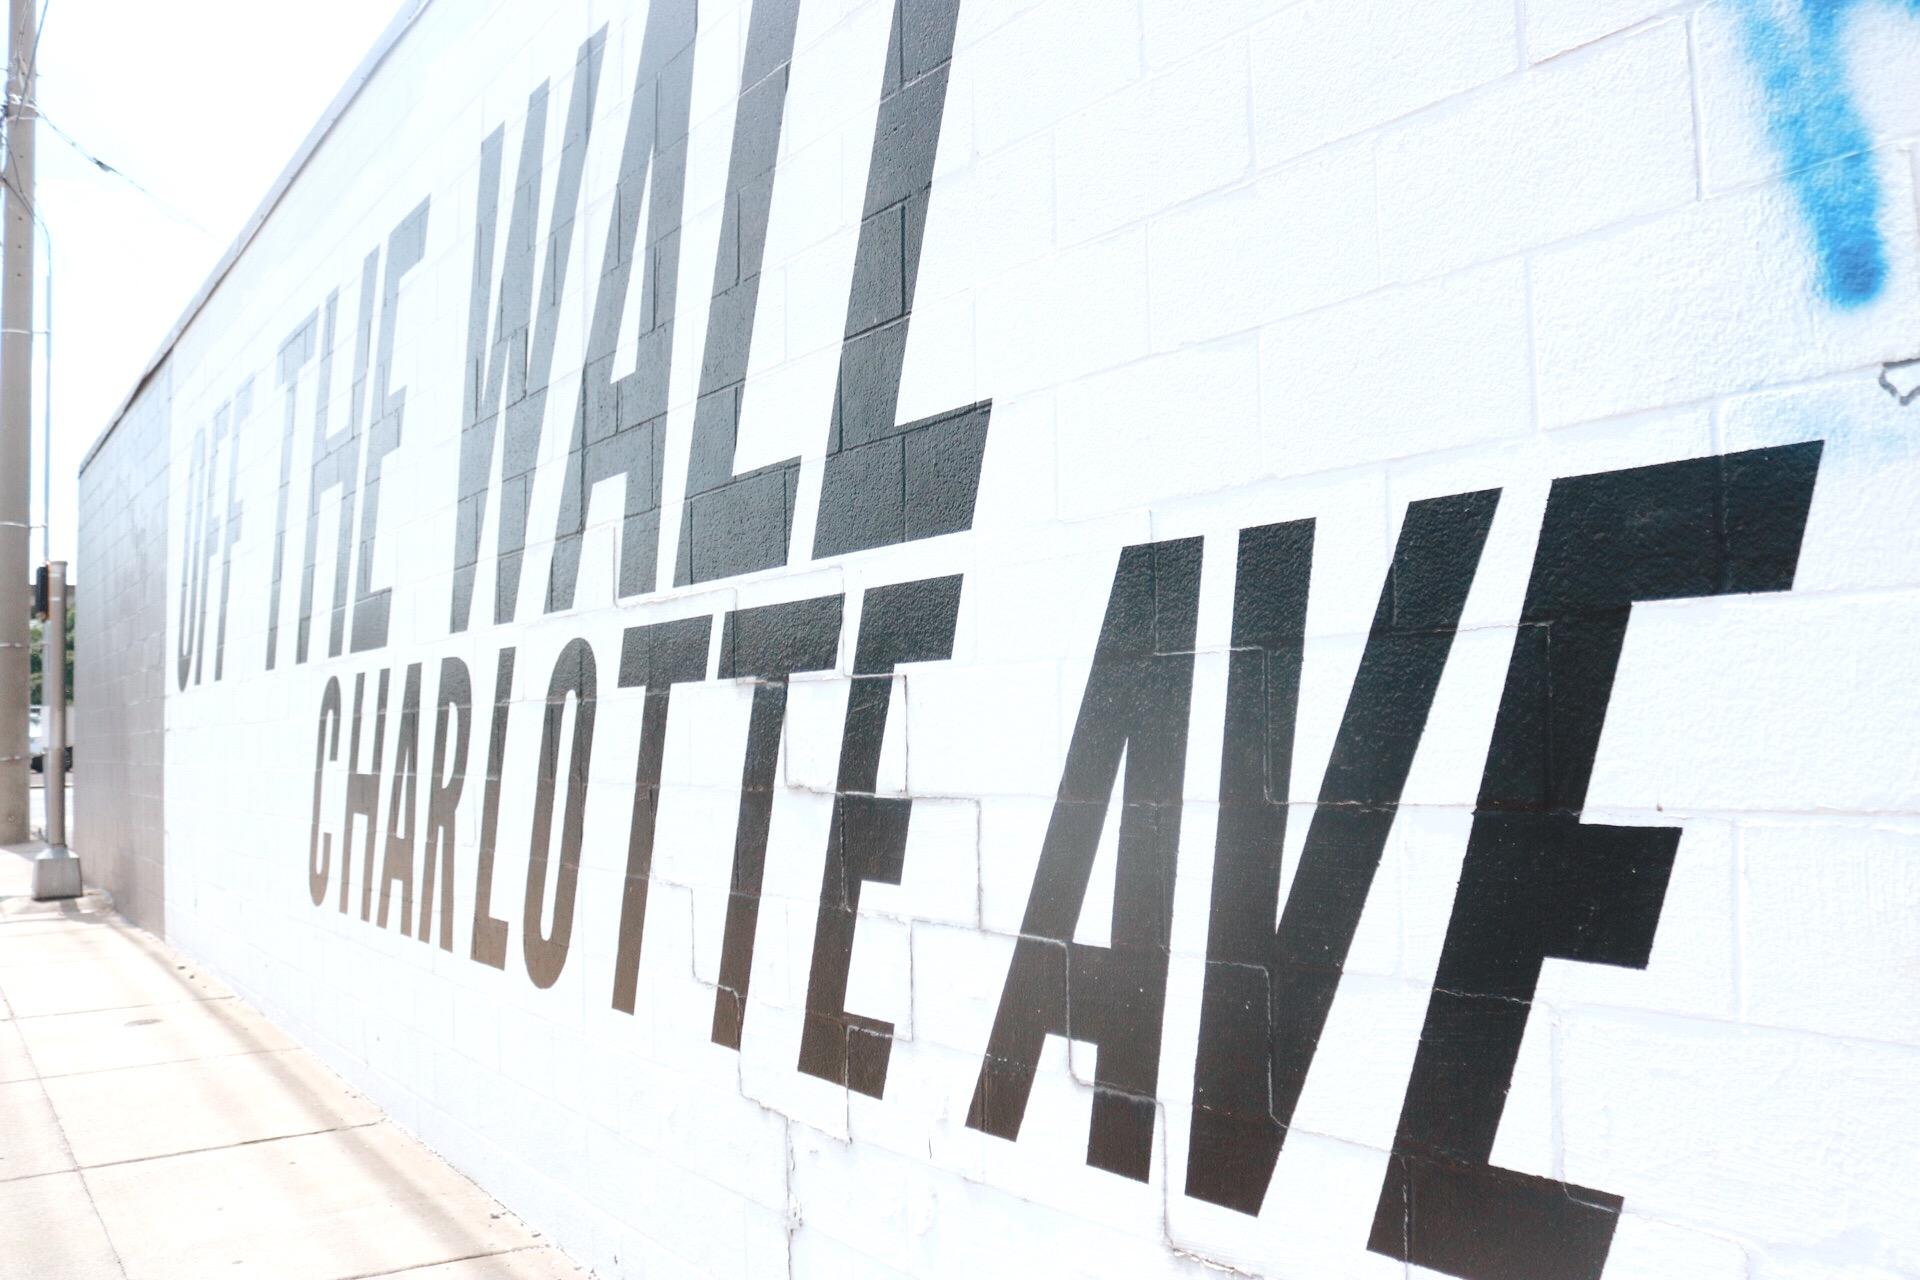 Nashville Murals - A Complete Guide  Nashville Walls | SaltWaterVibes